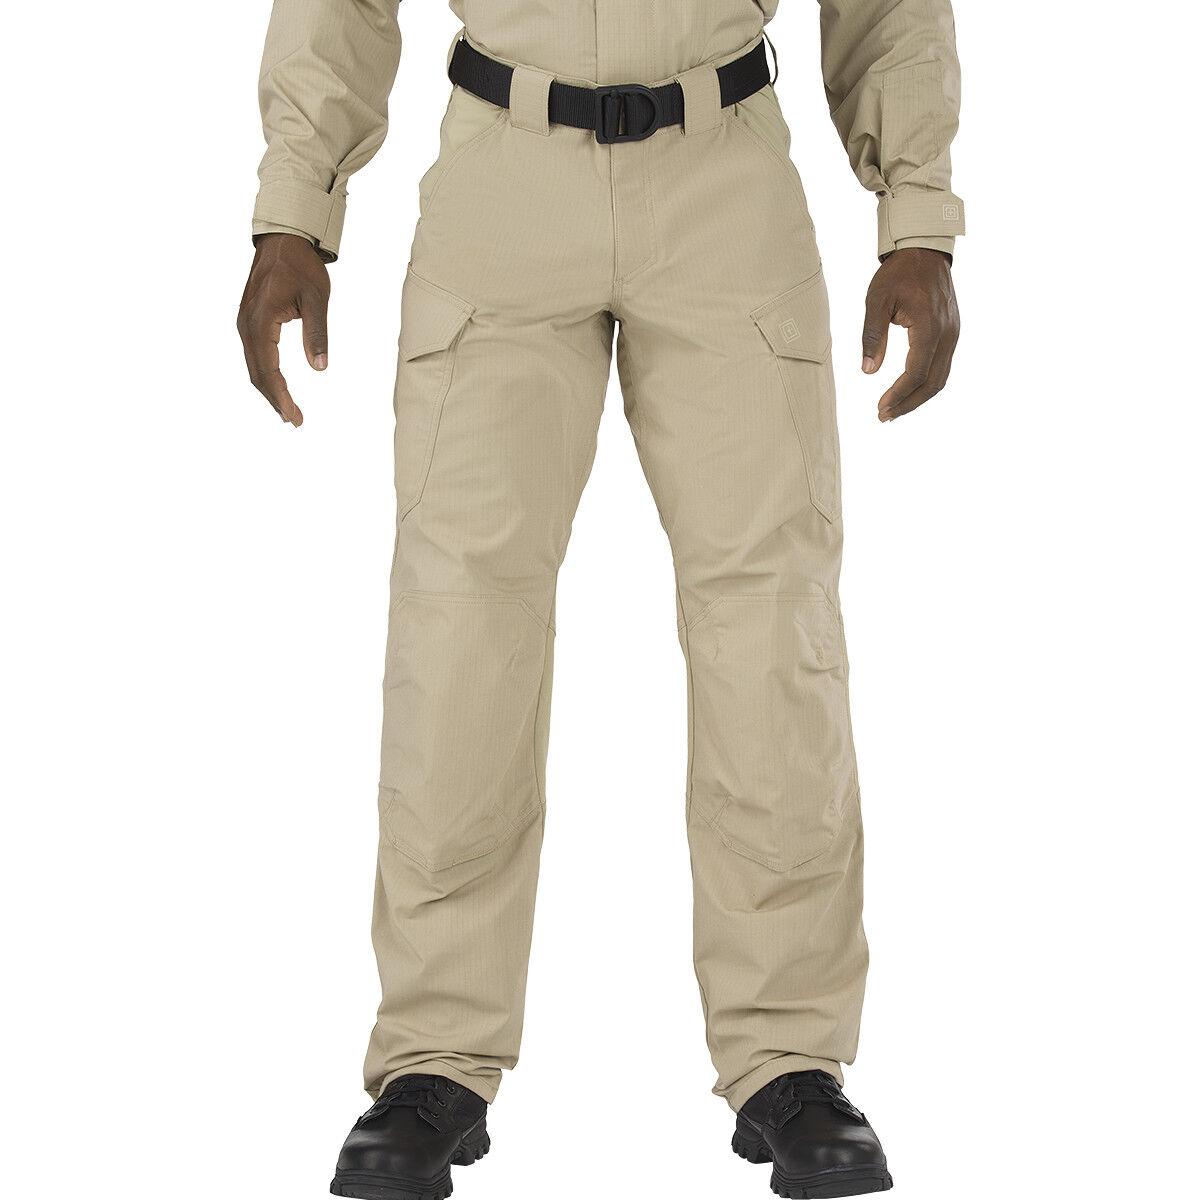 5.11 Stryke TDU Pants Army Patrol Trousers Military Combat Mens Cargos Khaki